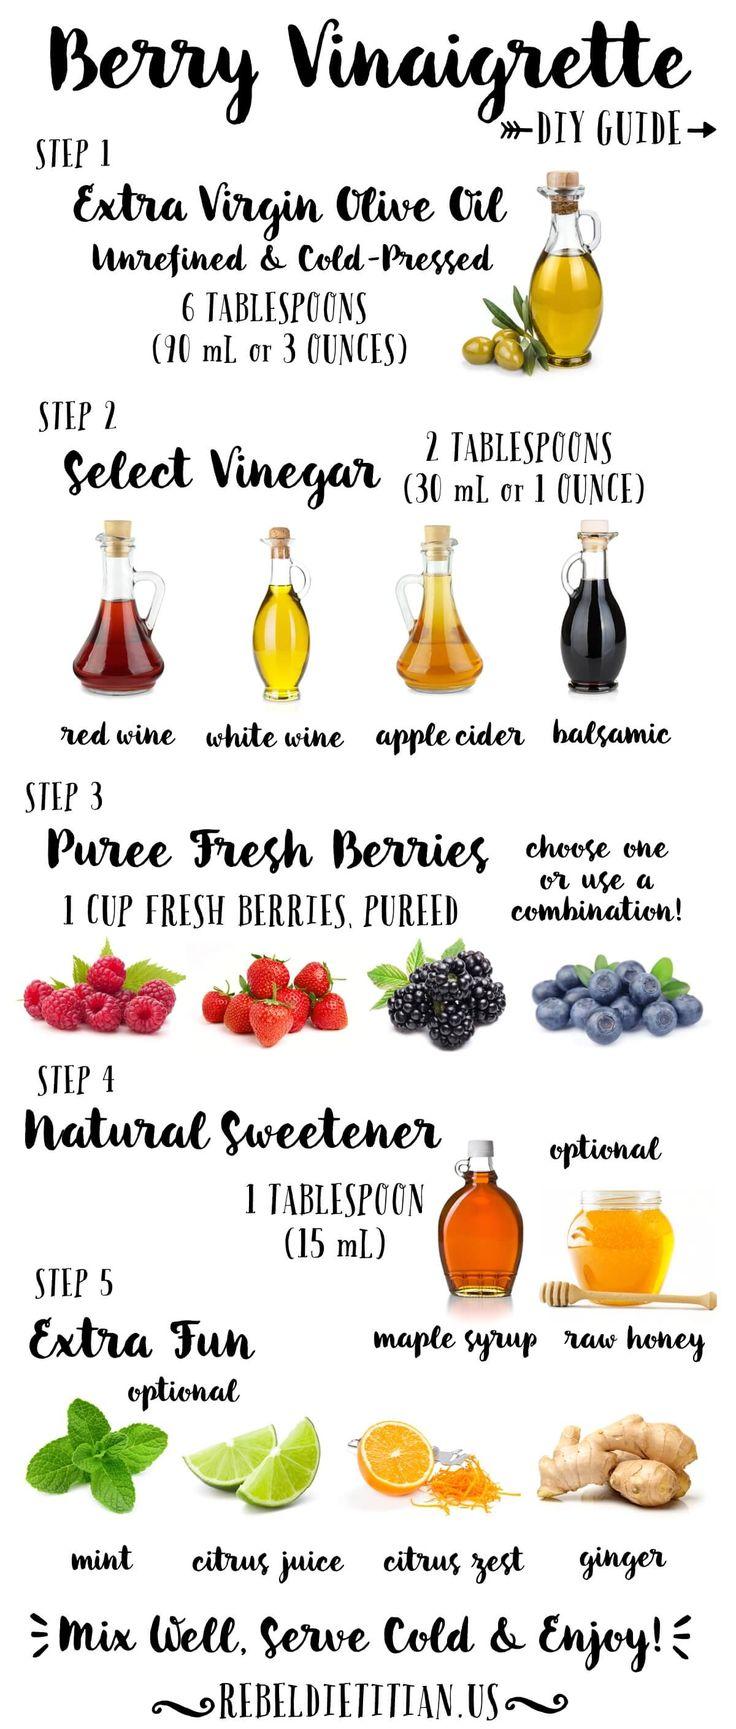 Berry Vinaigrette Guide | rebelDIETITIAN.US